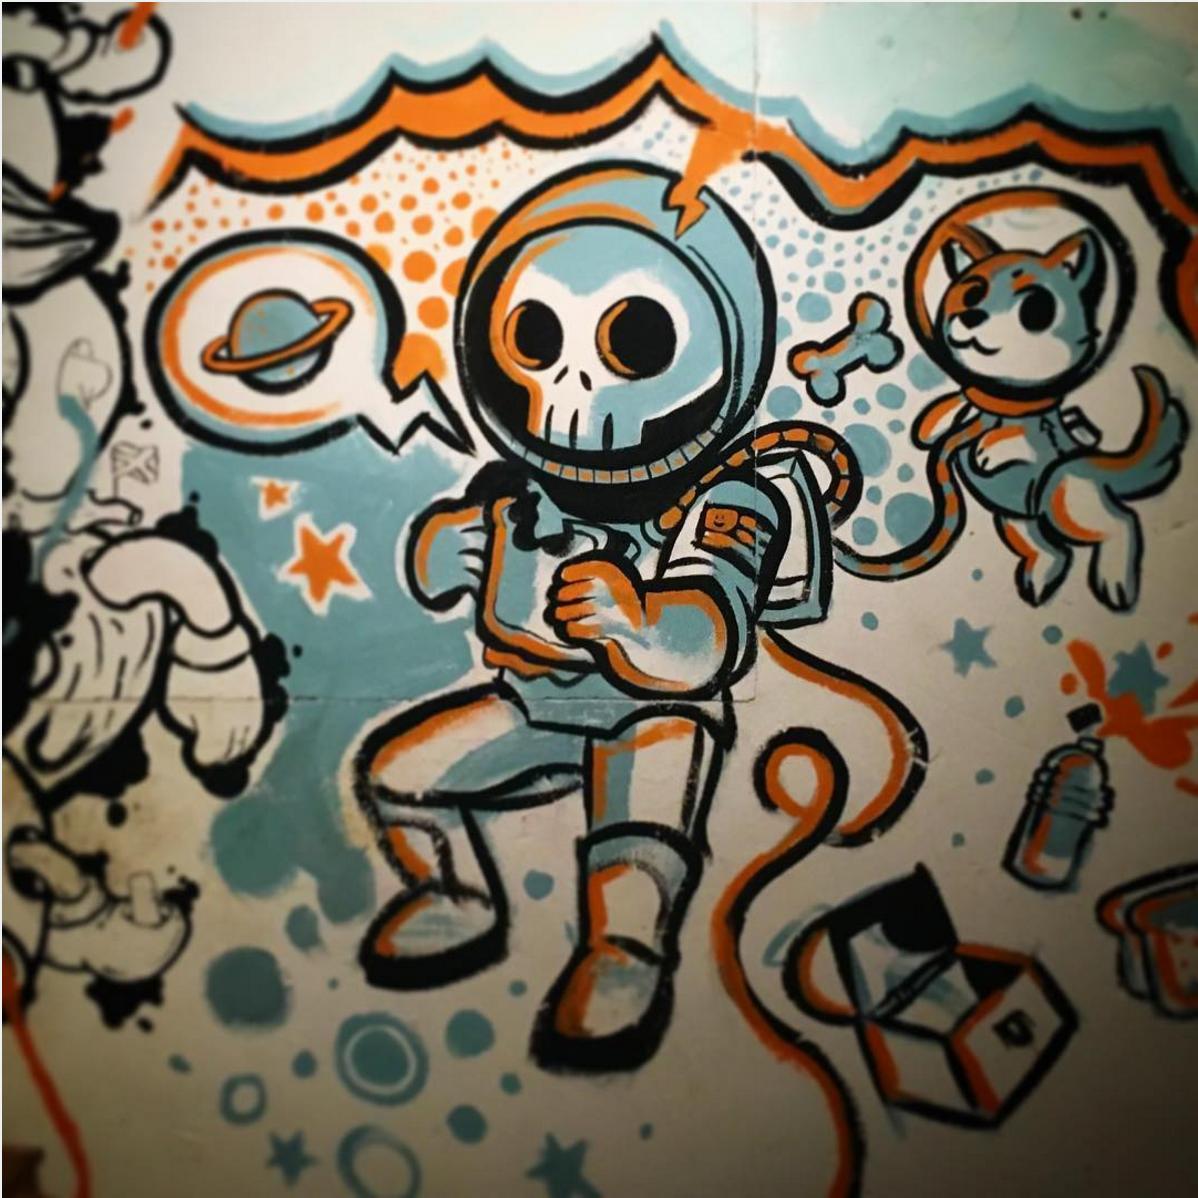 Mural_DreamLikeBubbles.png